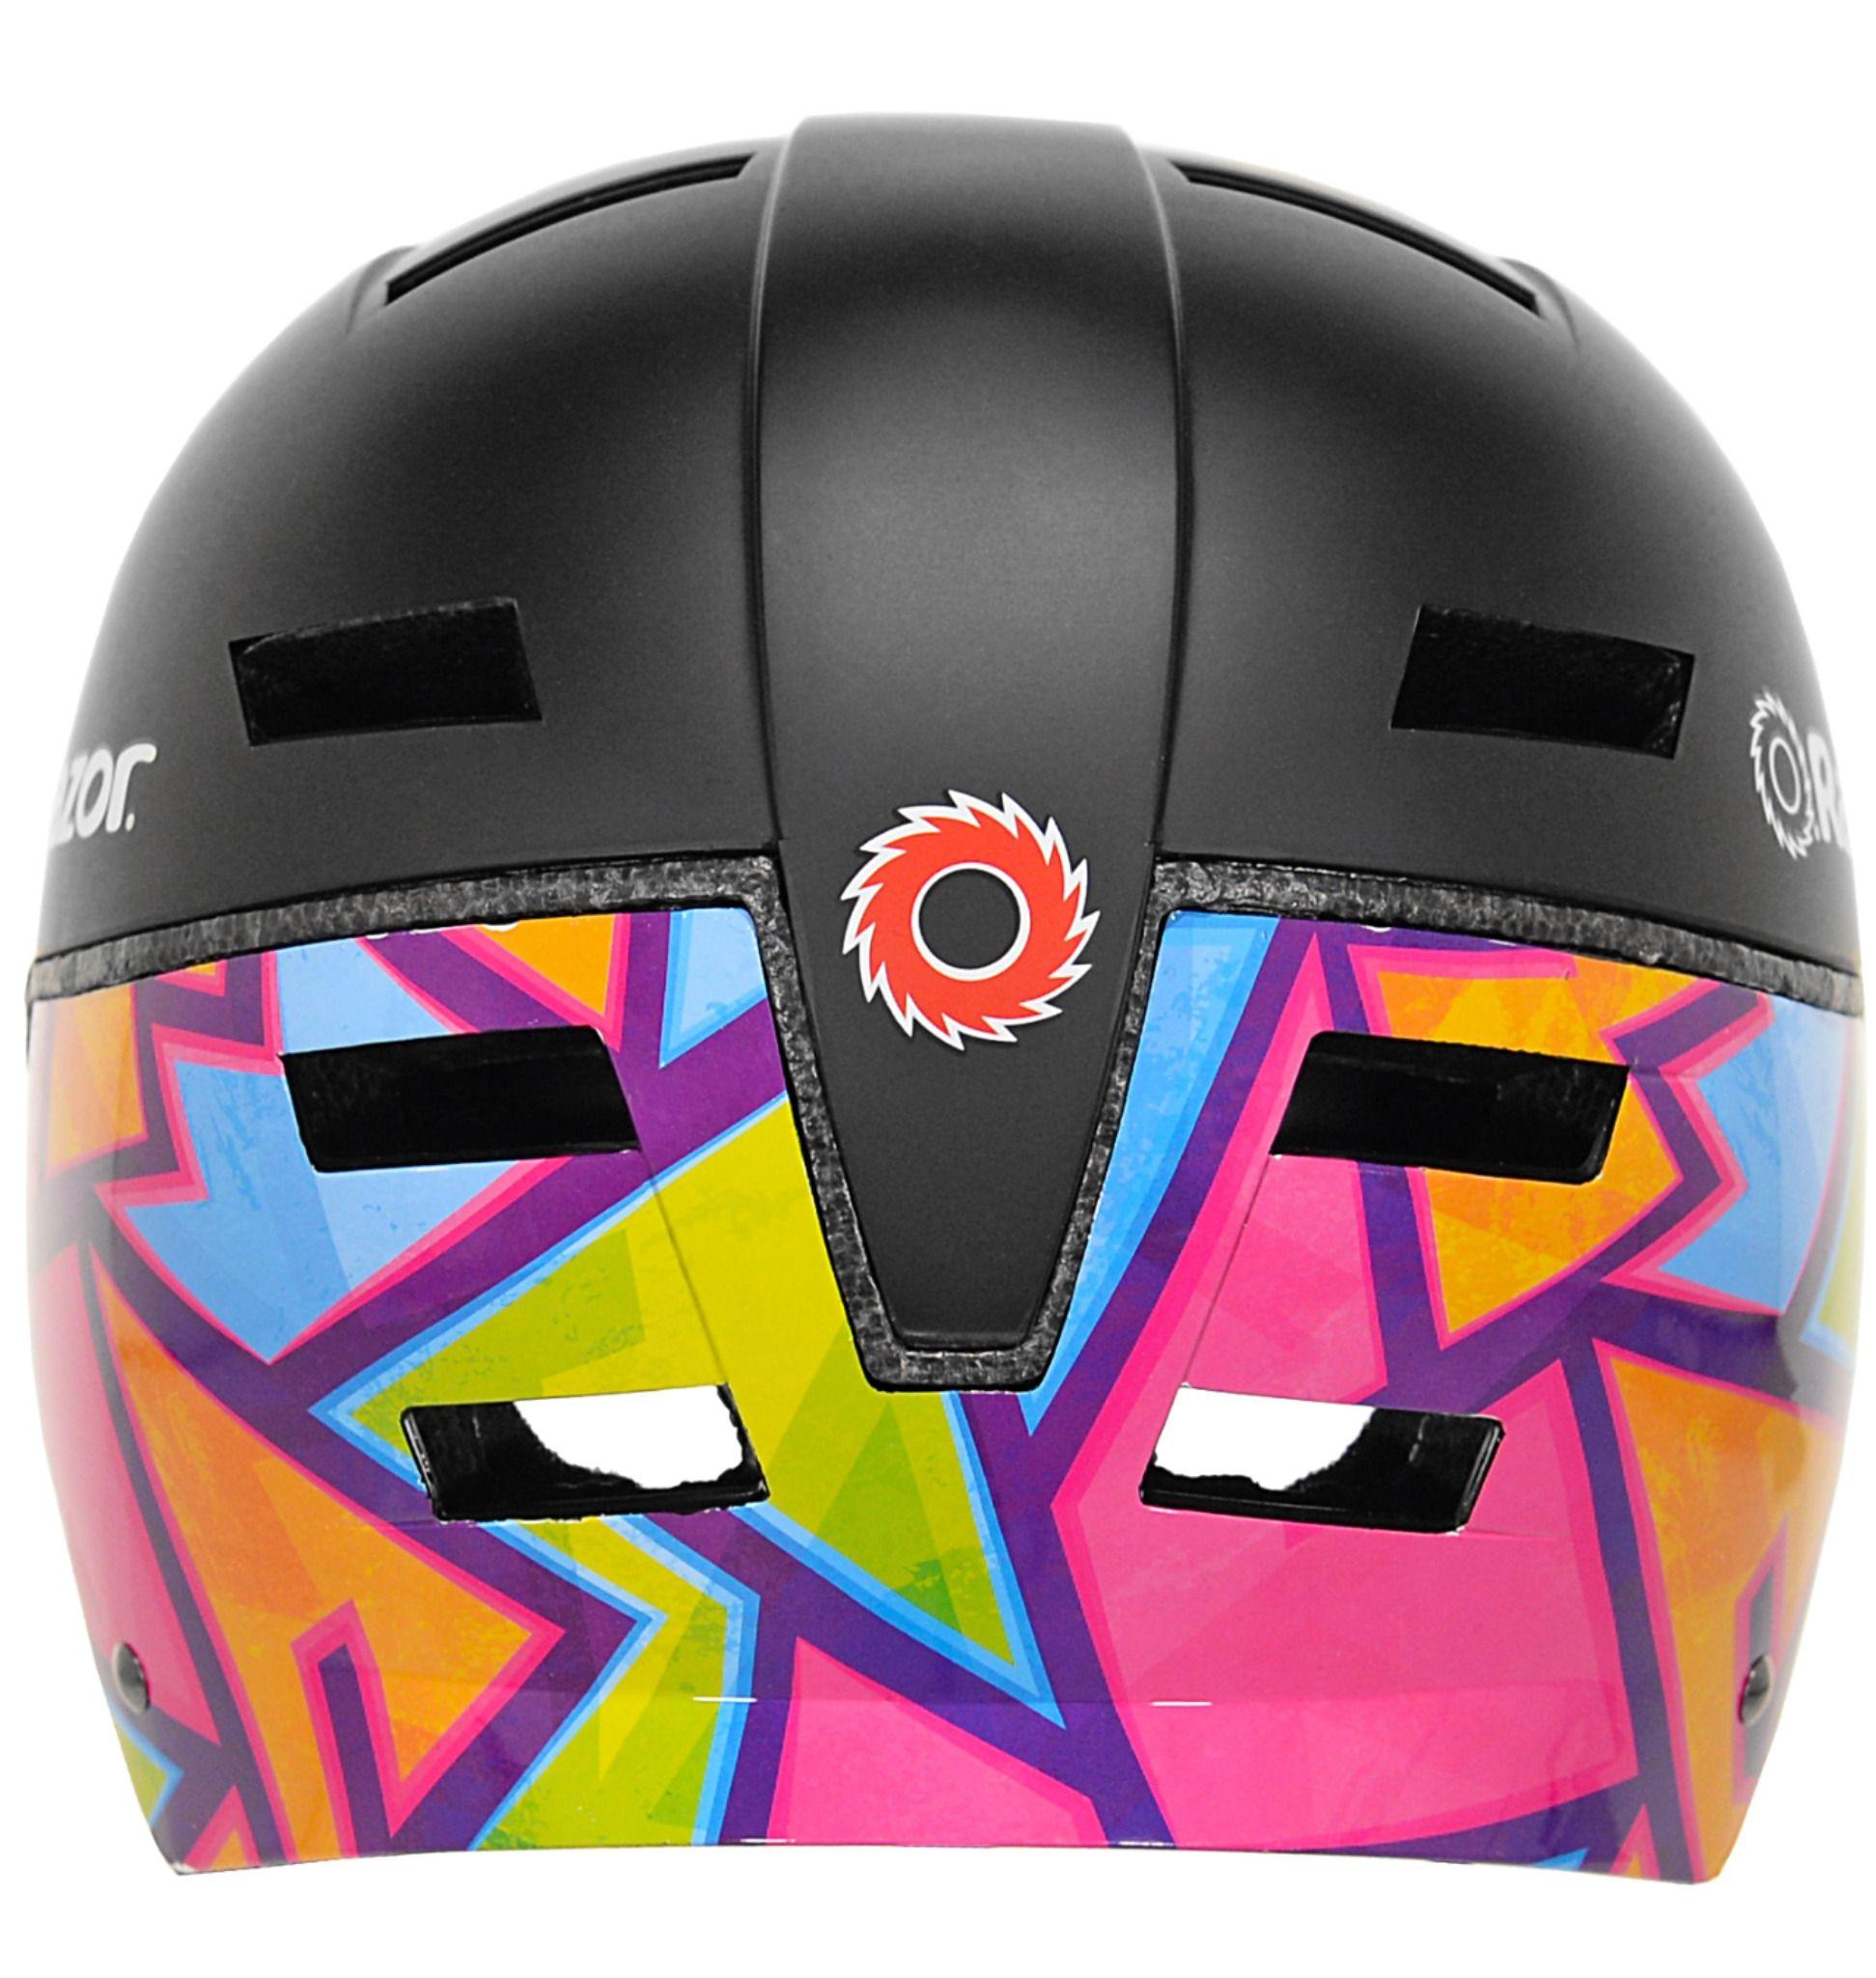 Razor Youth MultiSport Helmets, Ages 8 plus. Brand new